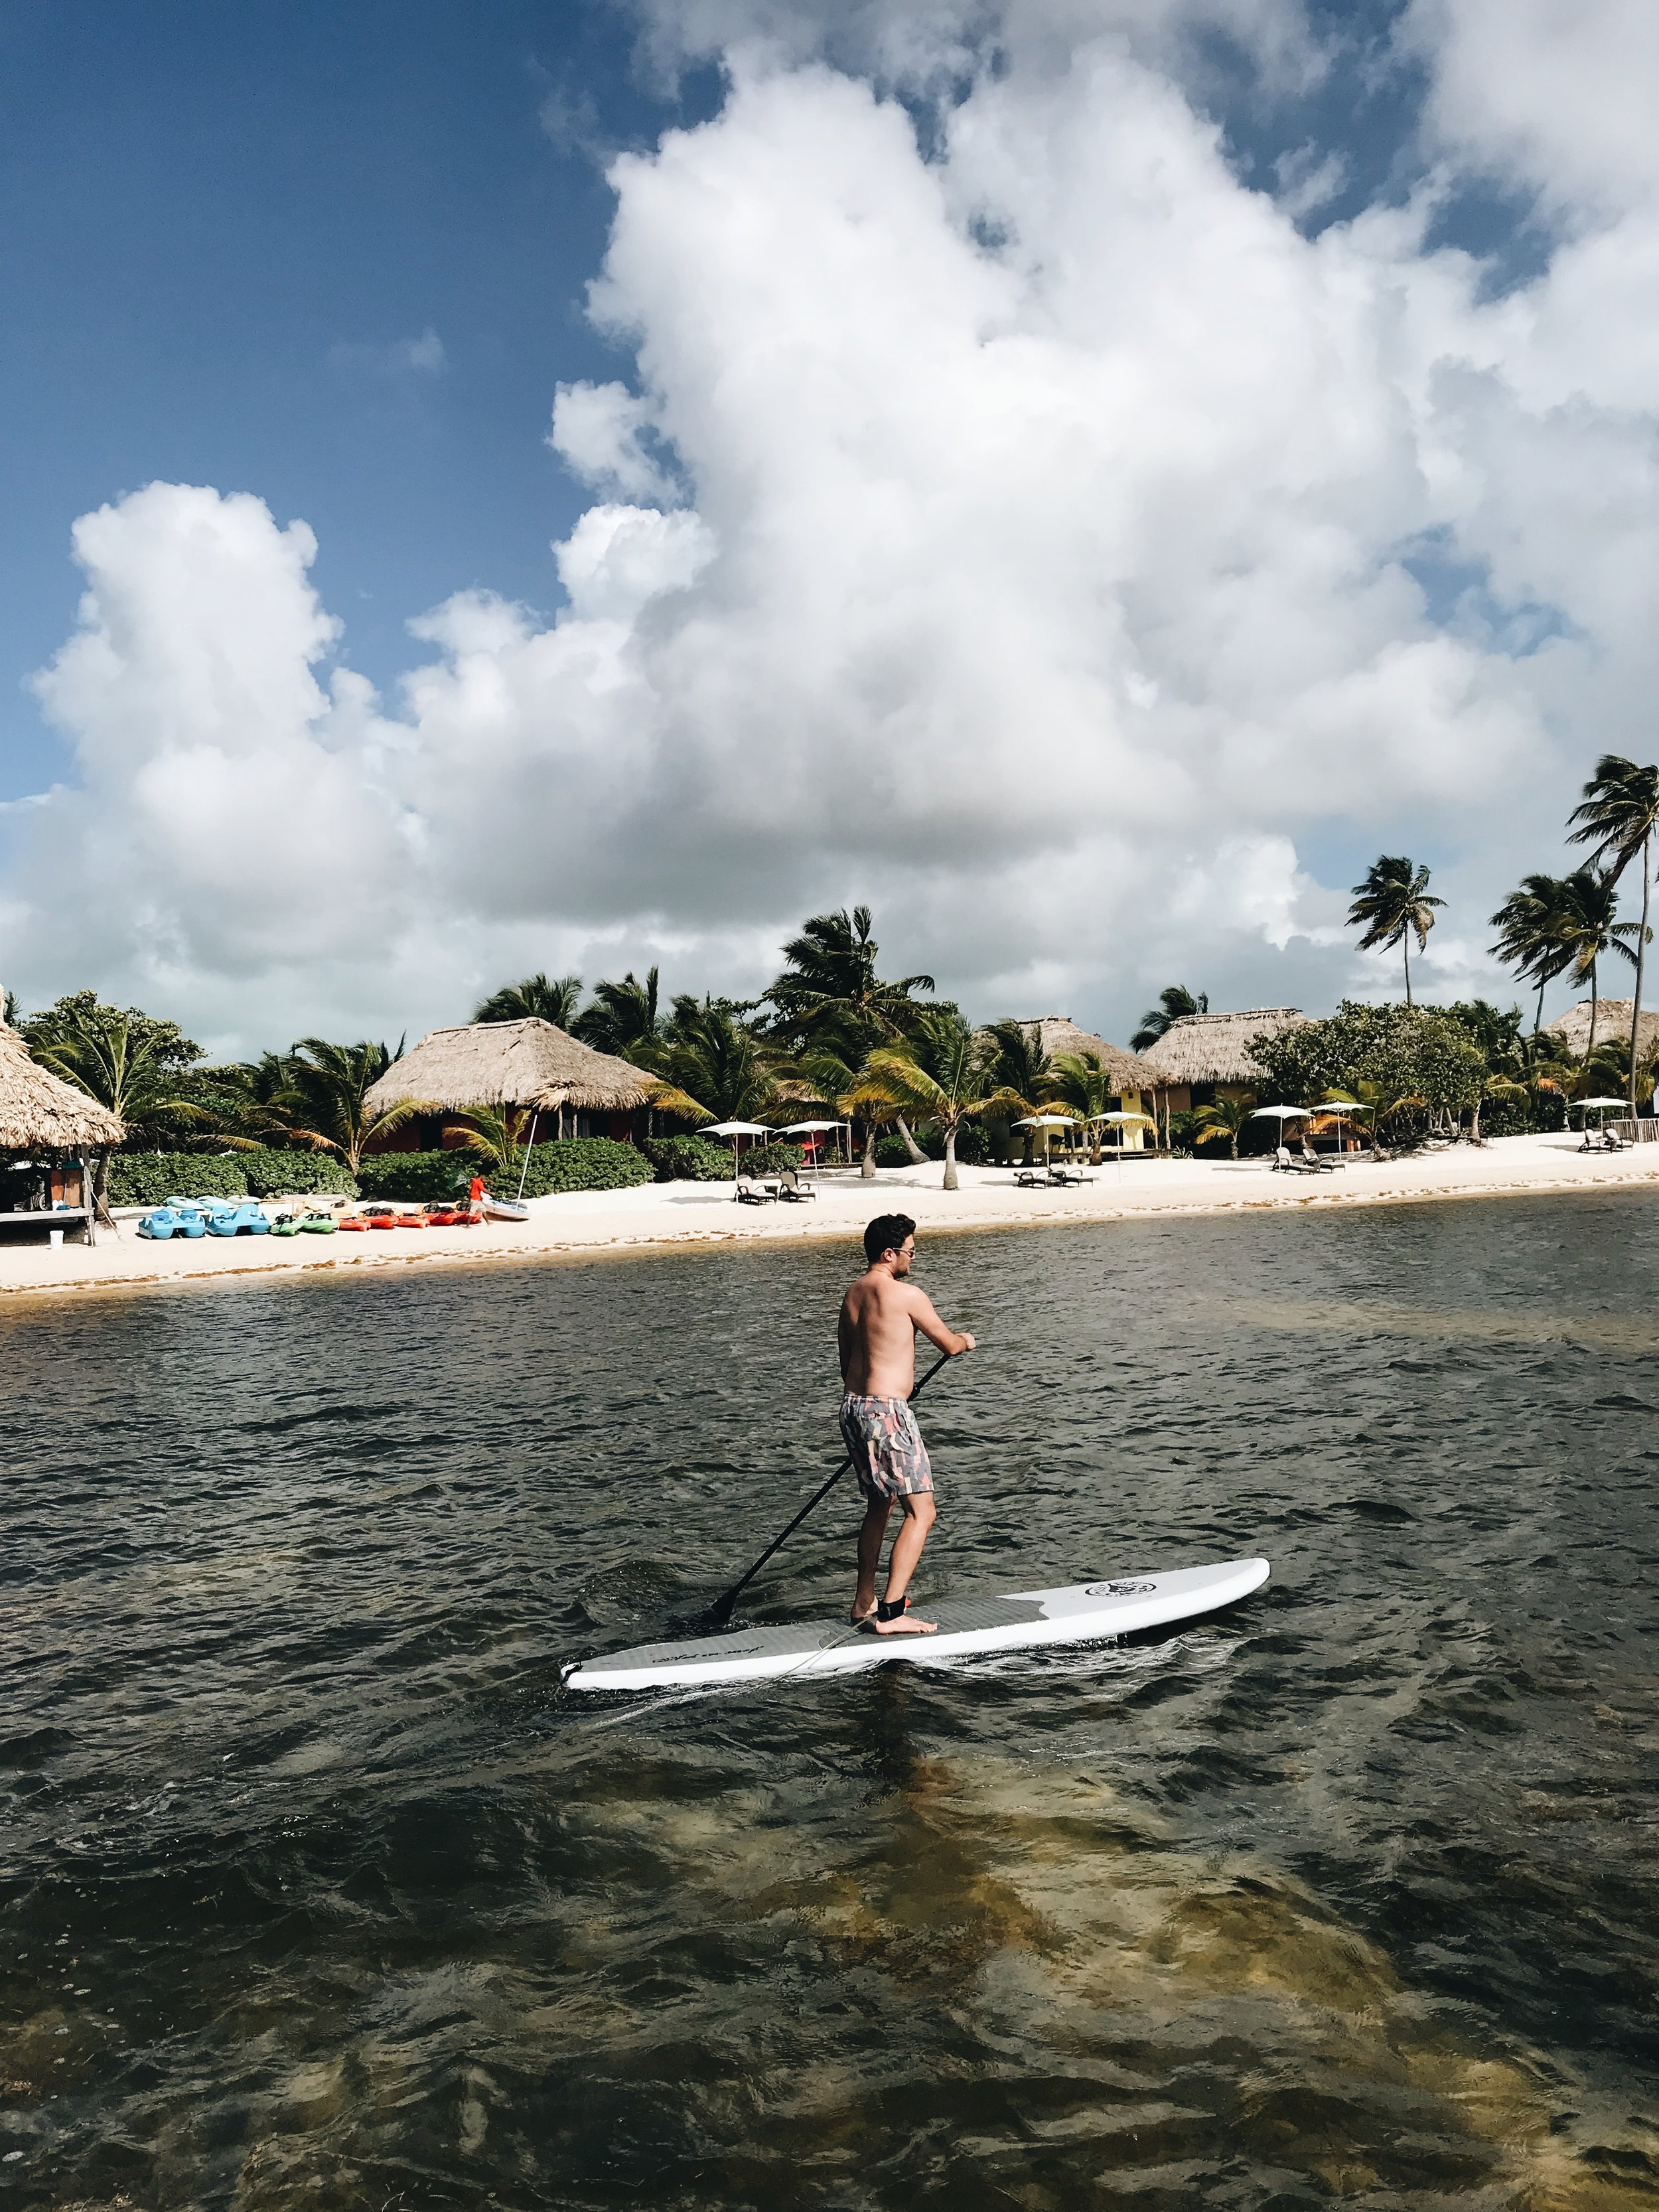 Paddle Boarding at Matachica Resort, Belize